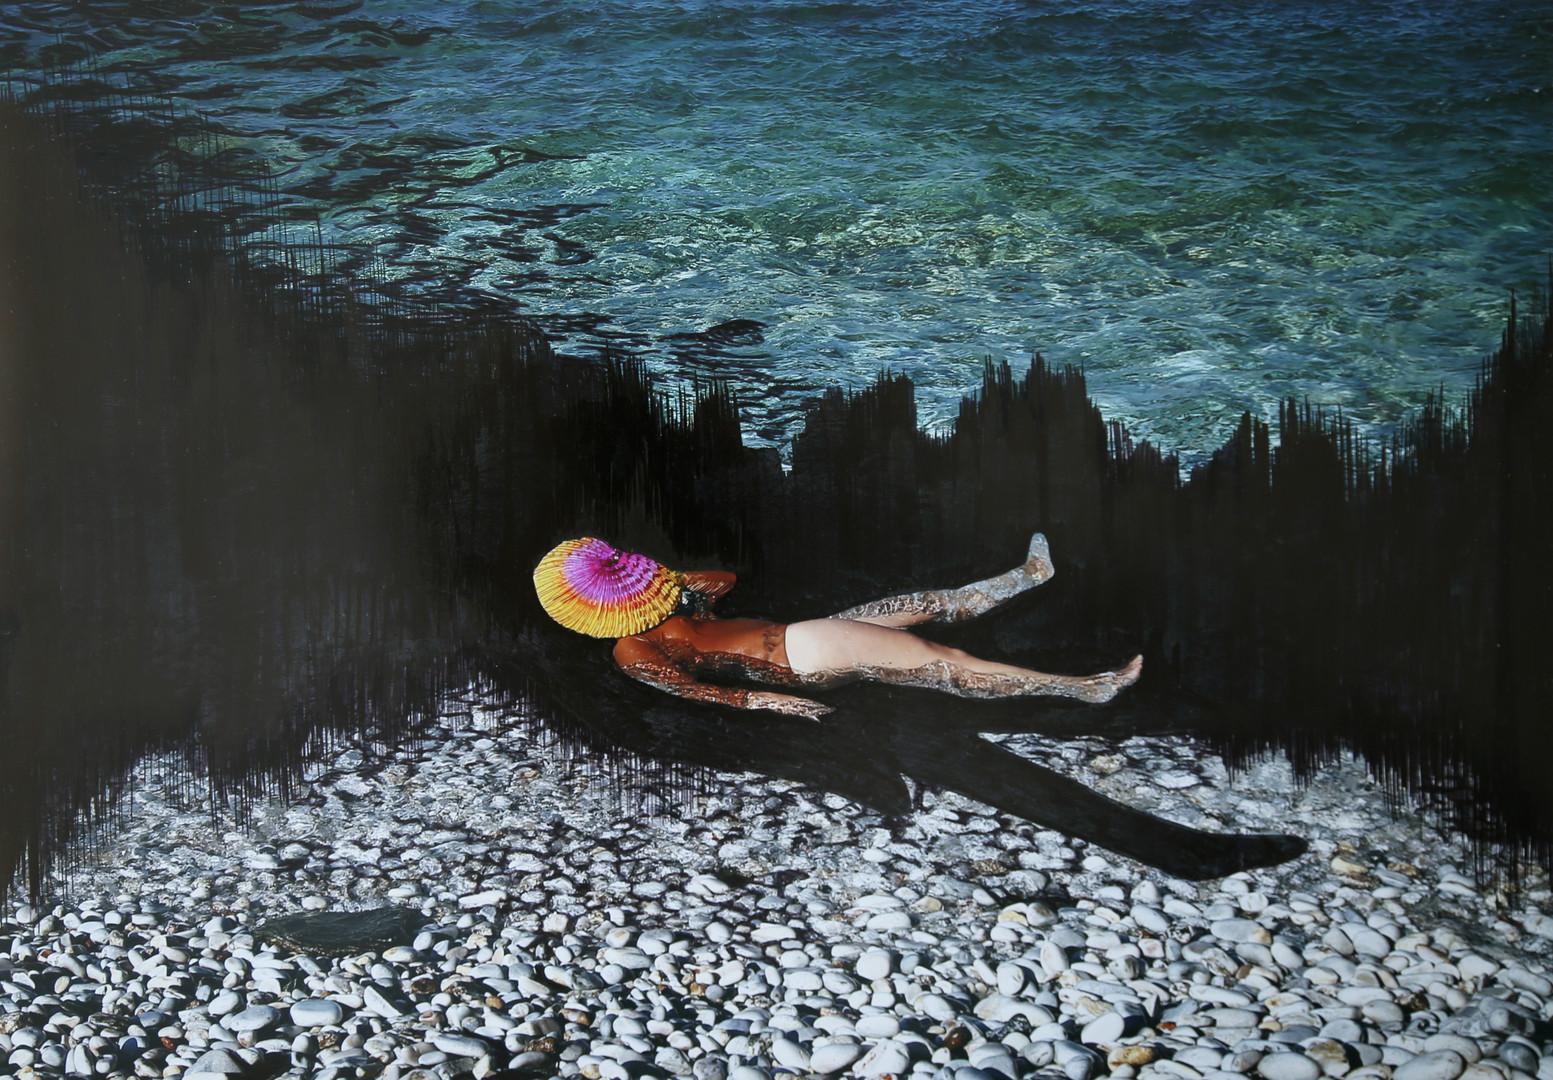 Floating on stones.